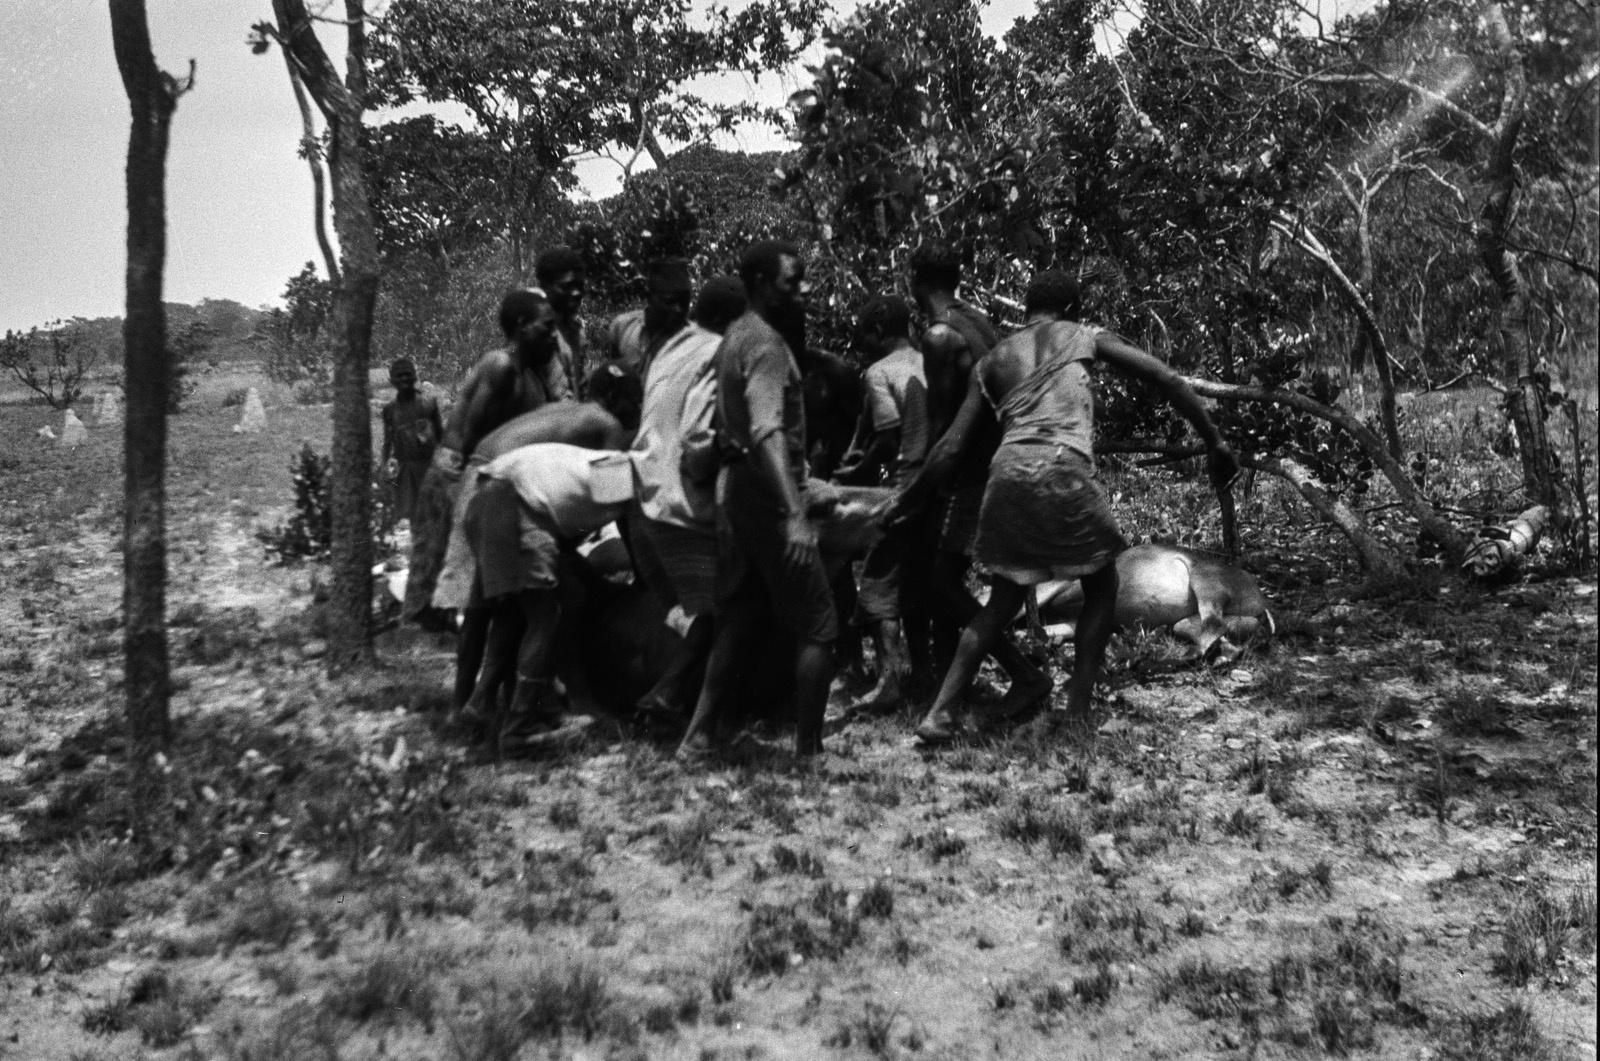 Касемпа. Мужчины несут убитую антилопу к краю дамбо